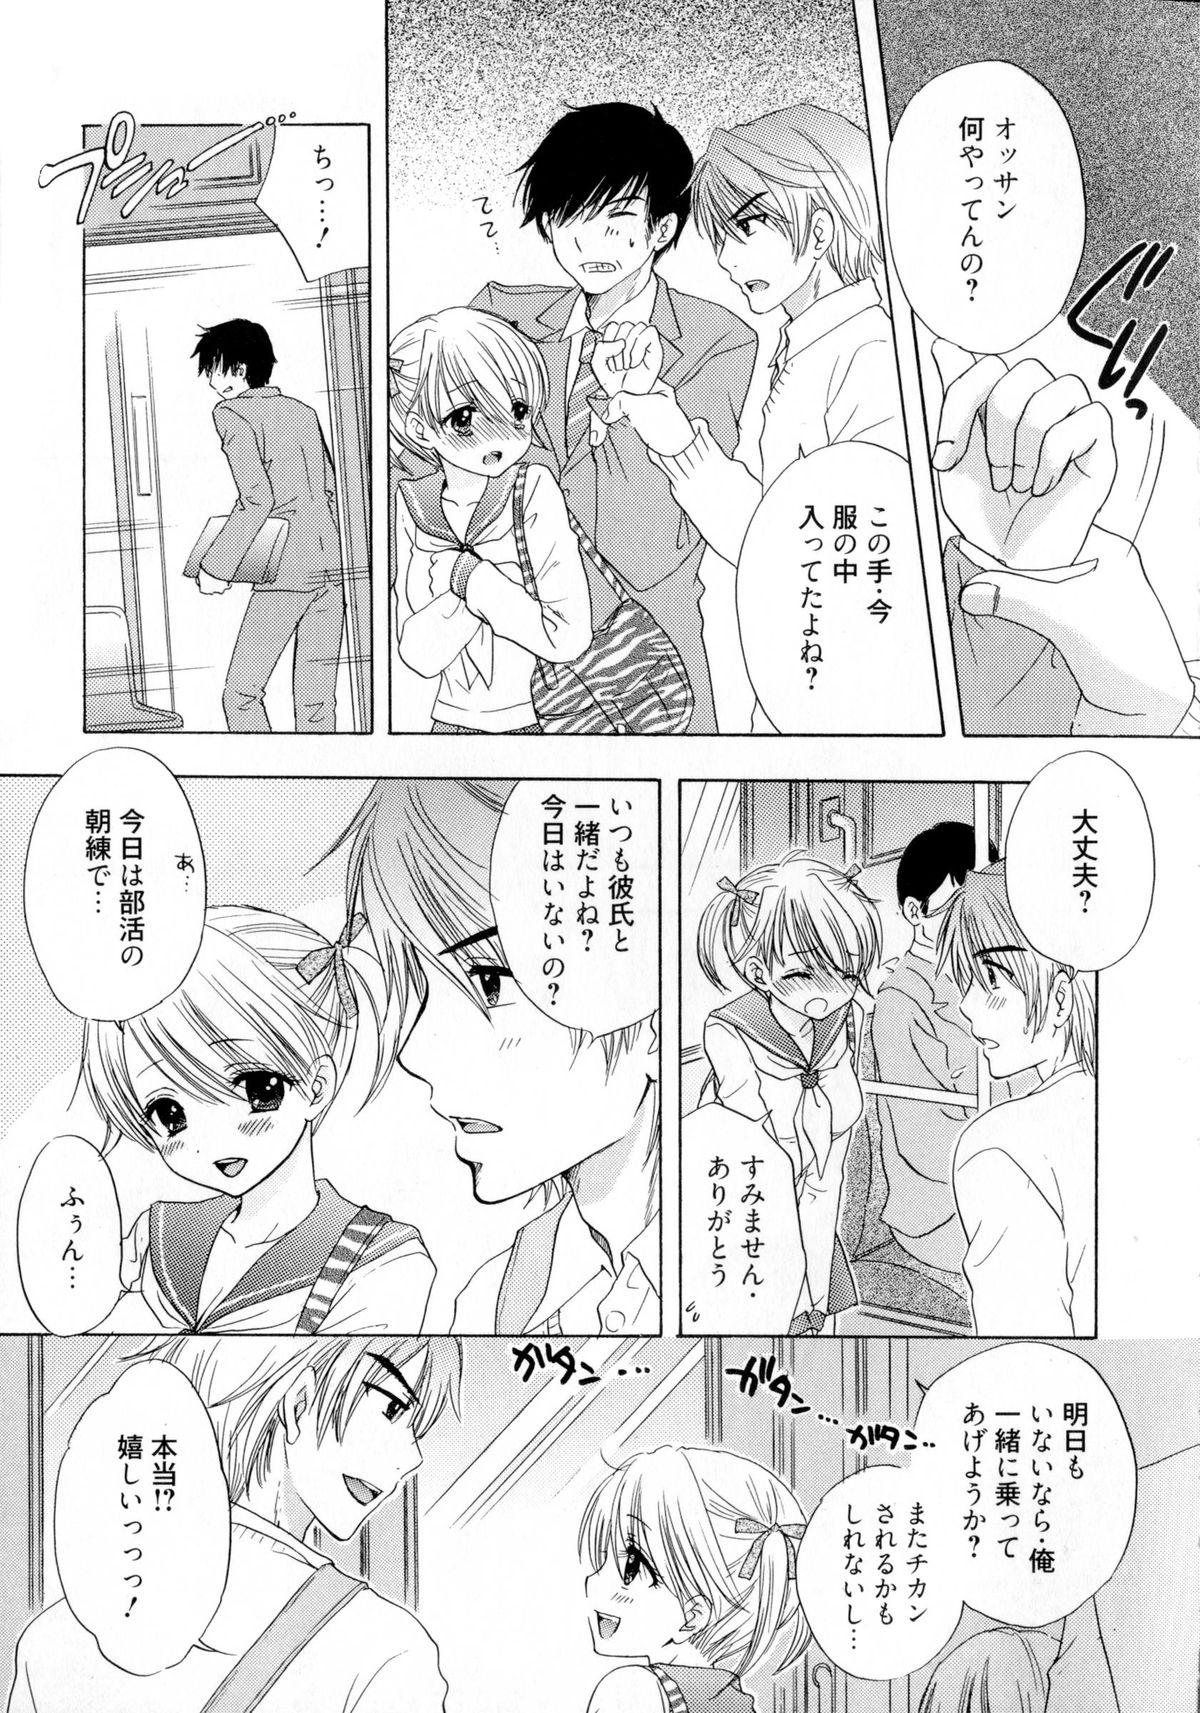 The Great Escape 4 Shokai Genteiban 58